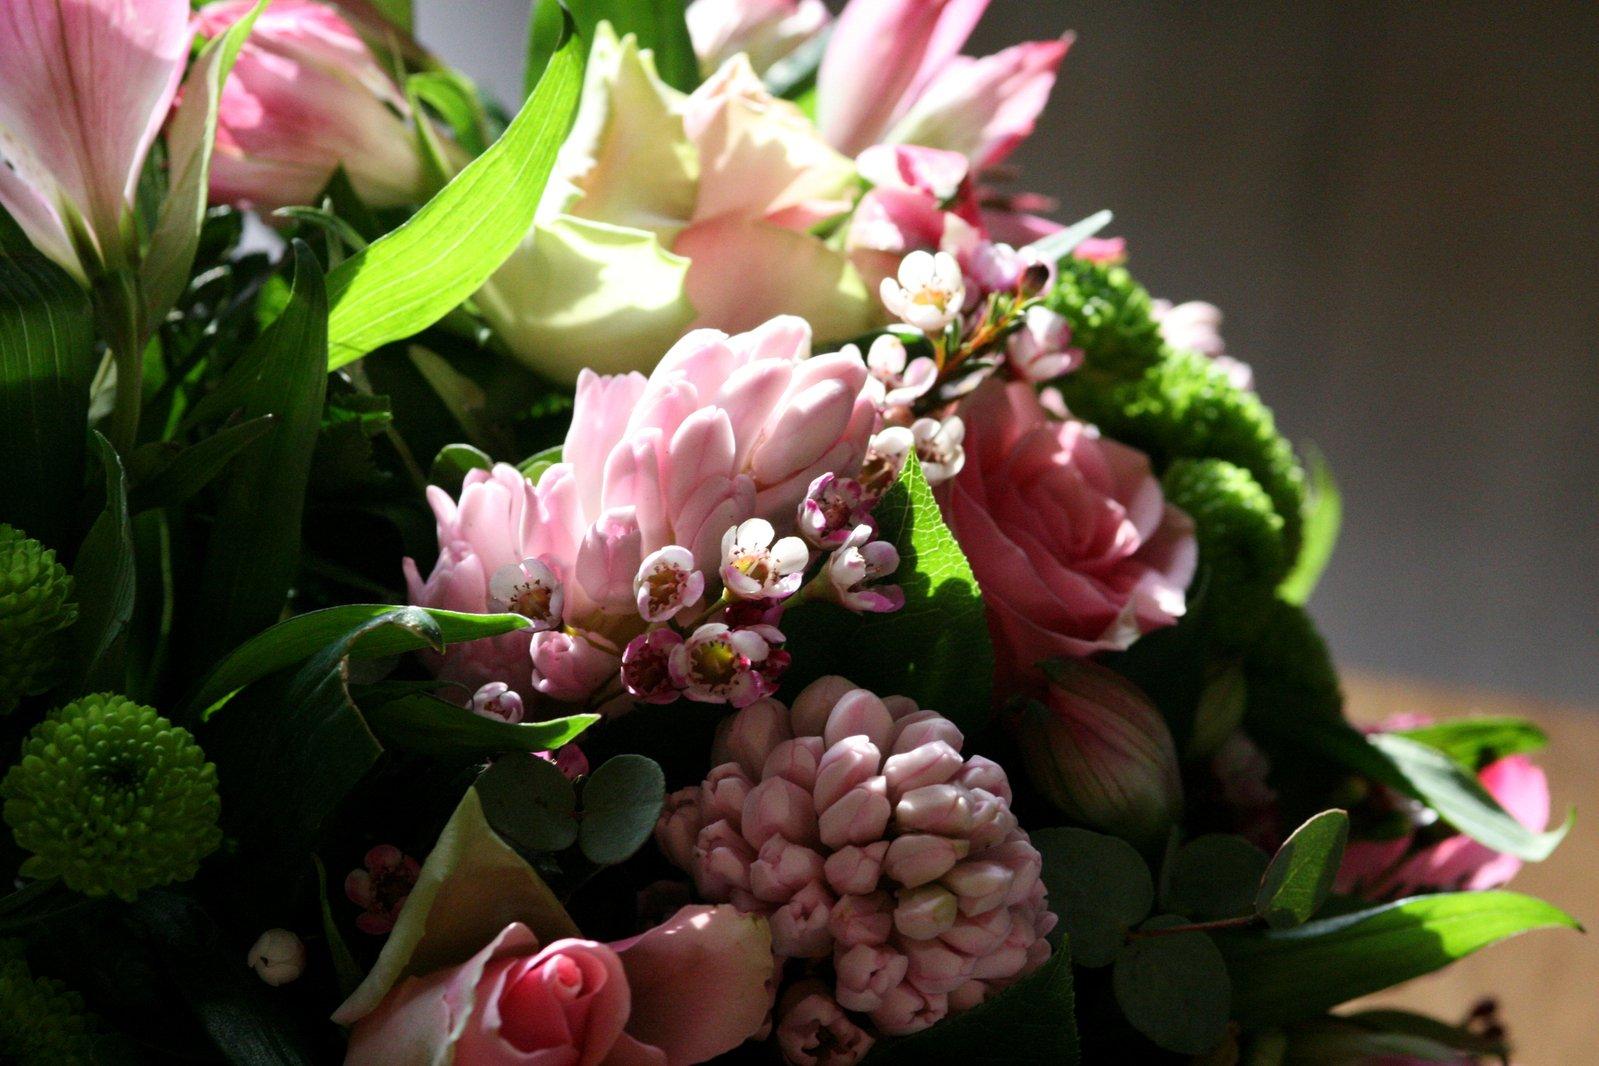 How To Make A Presentation Bouquet Flower Pressflower Press